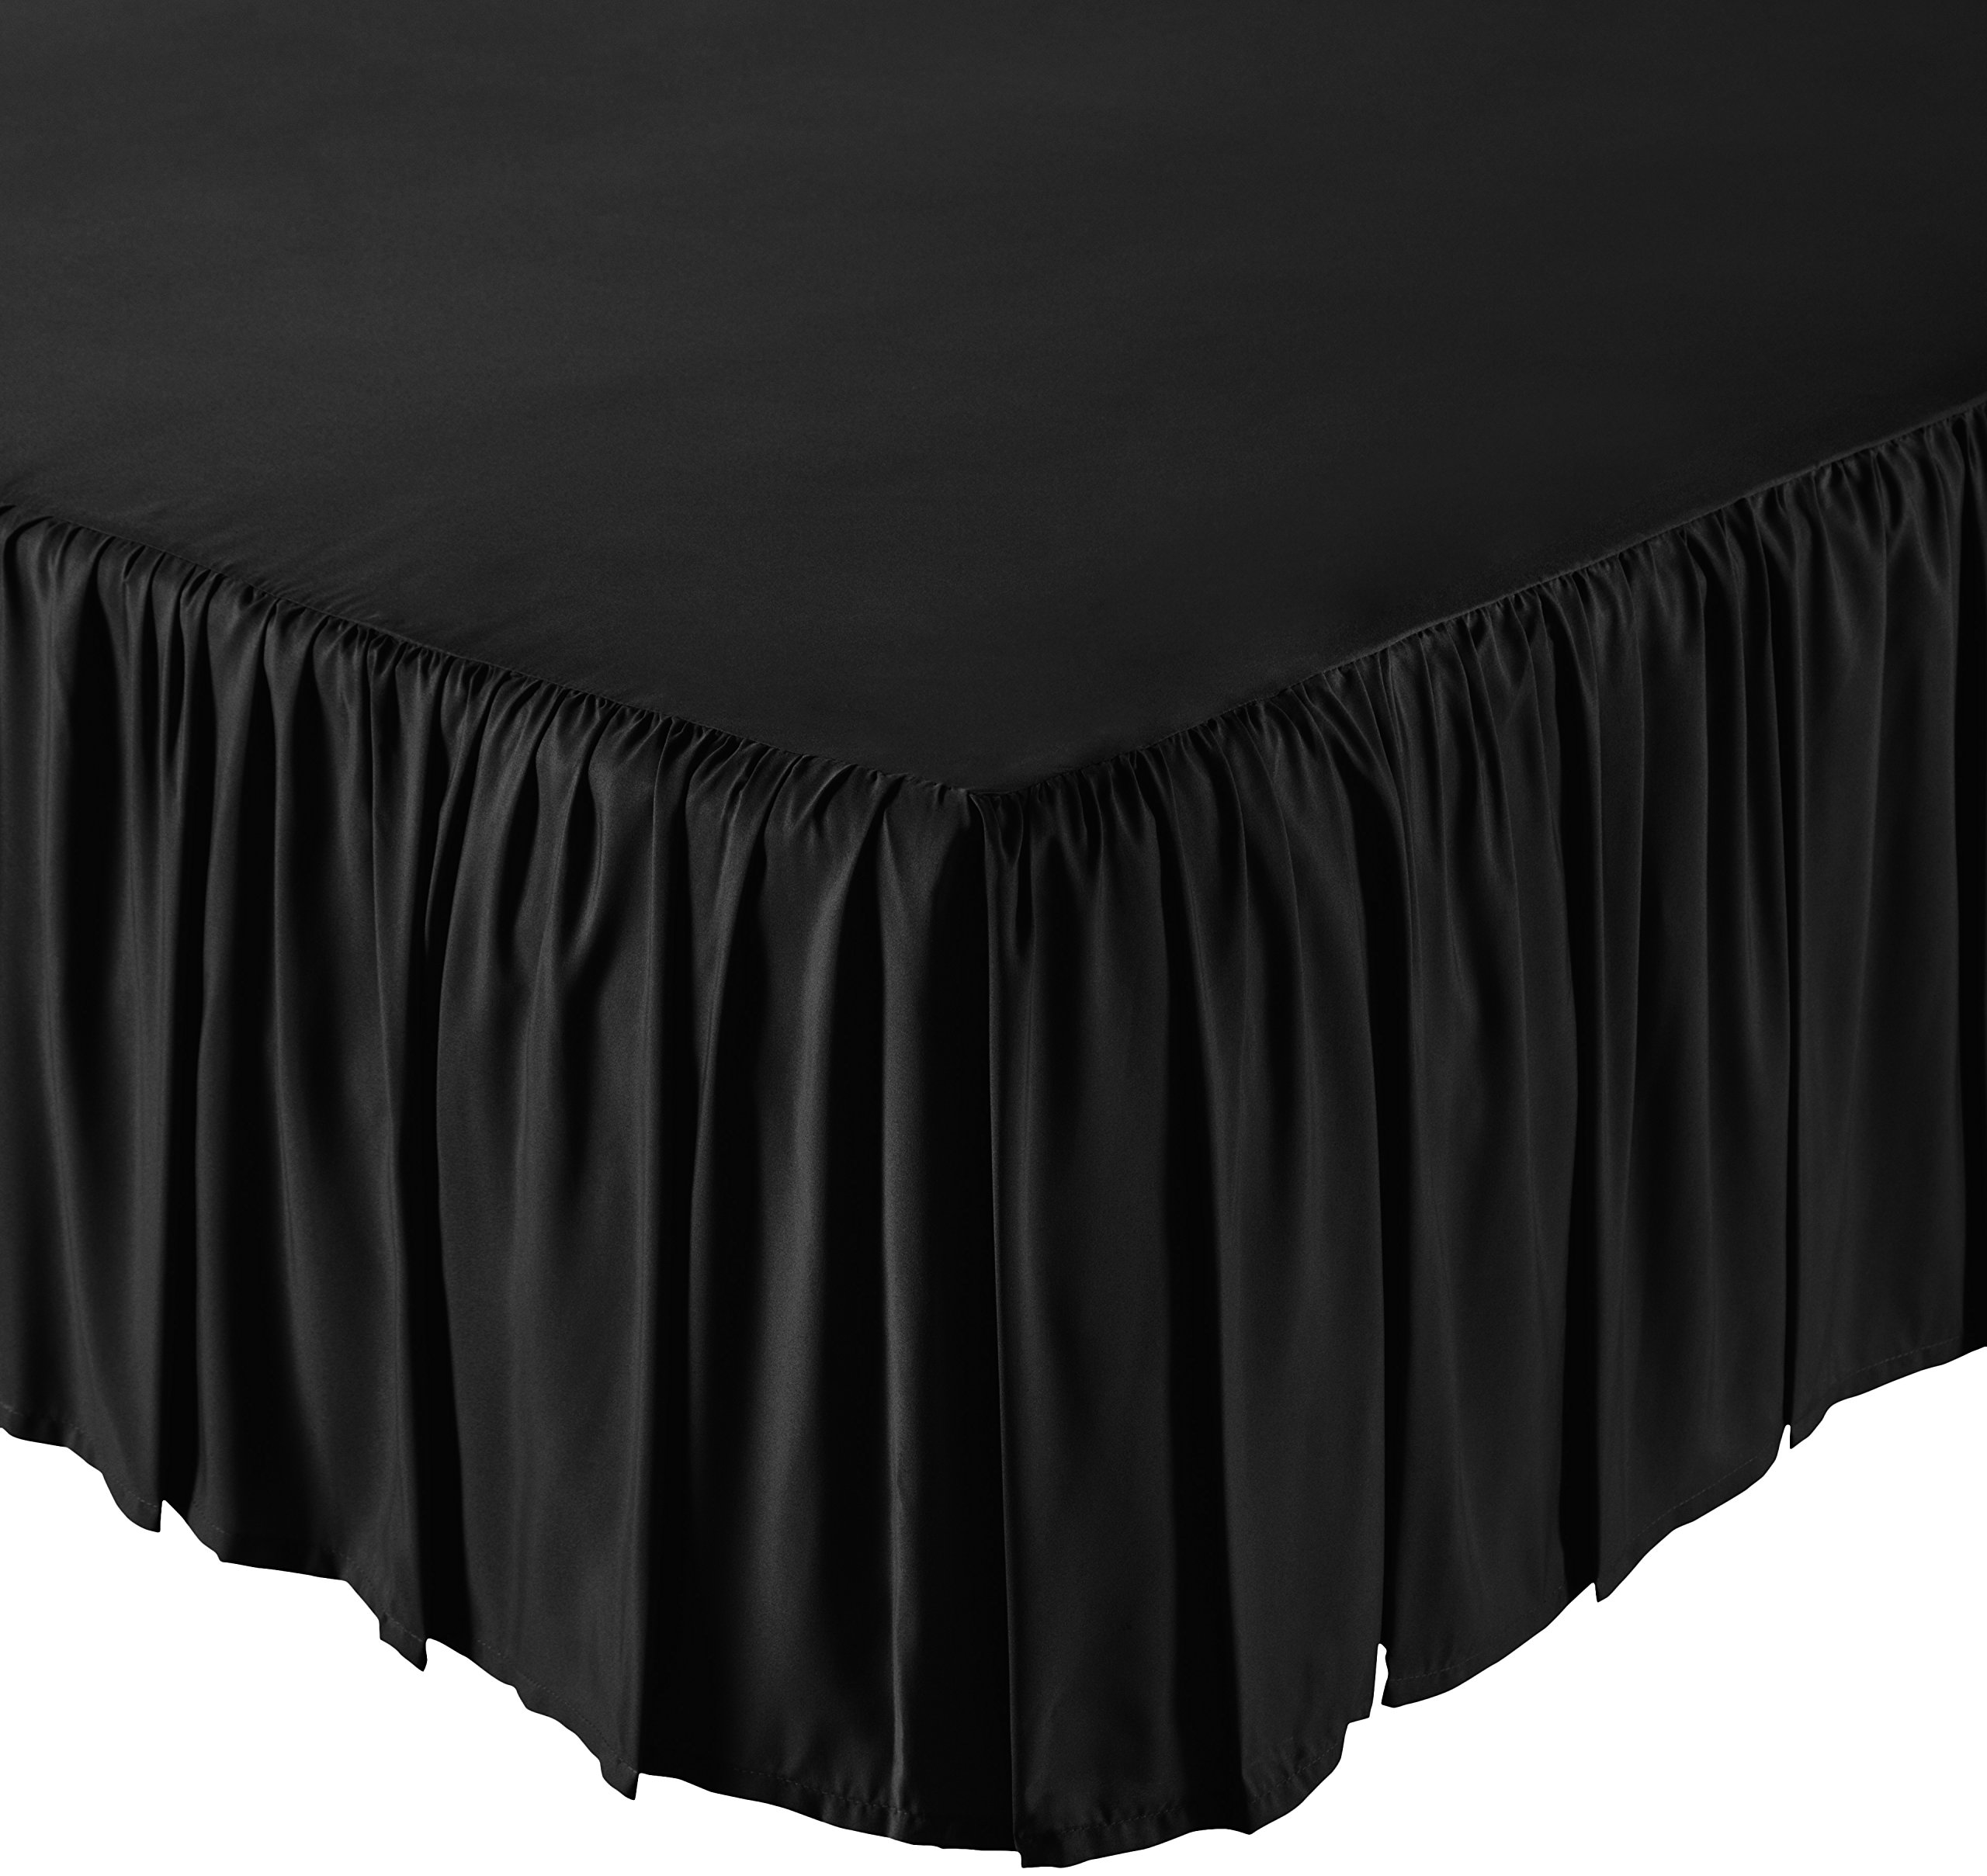 AmazonBasics Ruffled Bed Skirt - Queen, Black